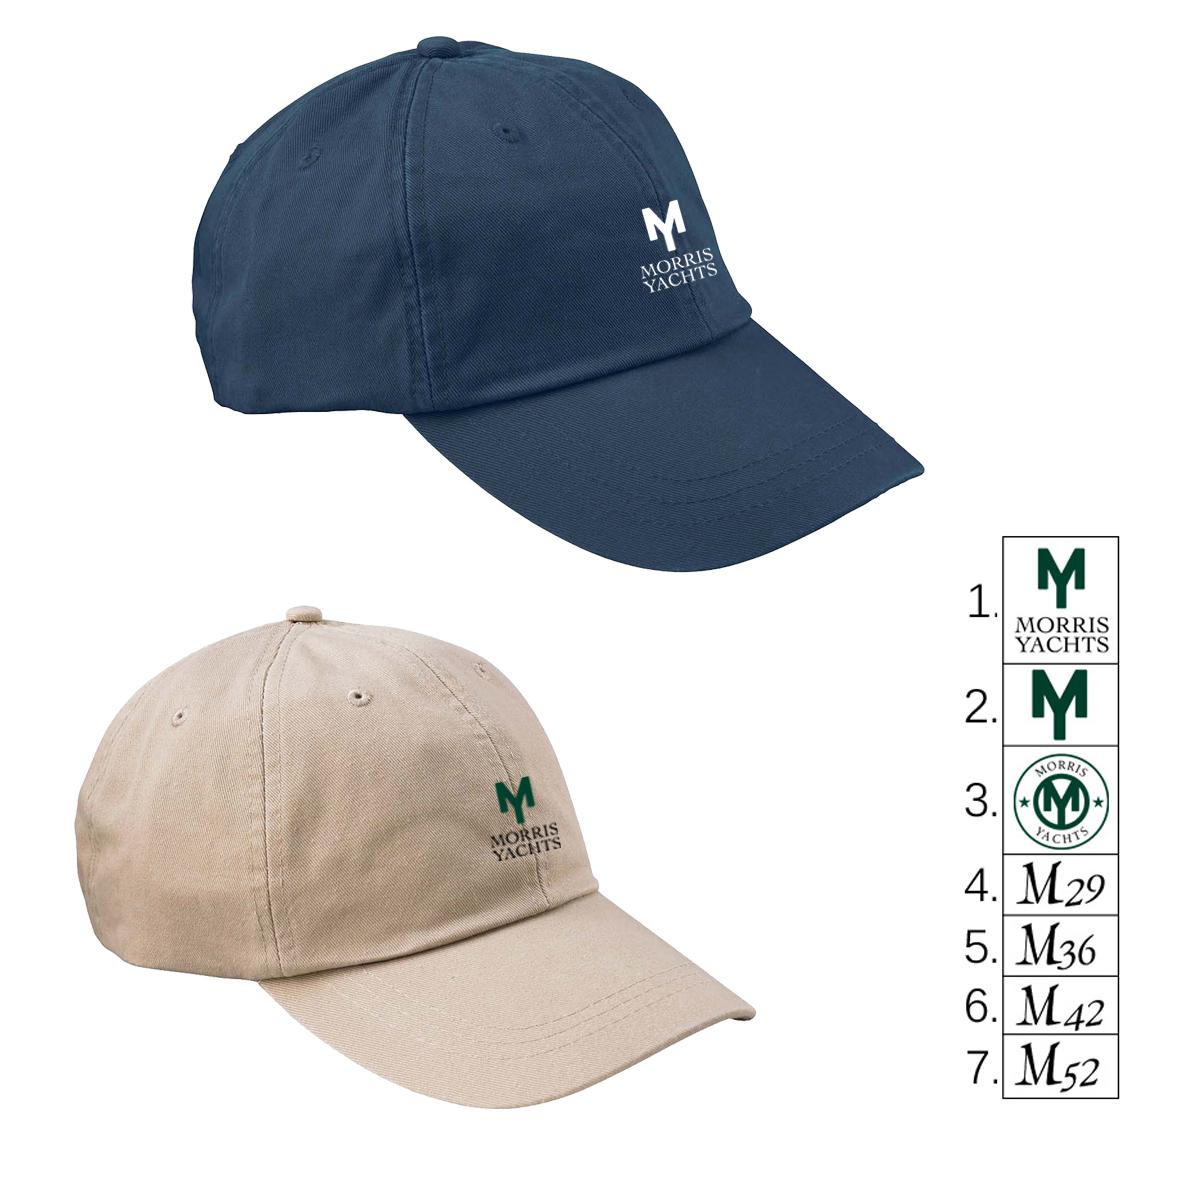 MORRIS YACHTS - BALL CAP